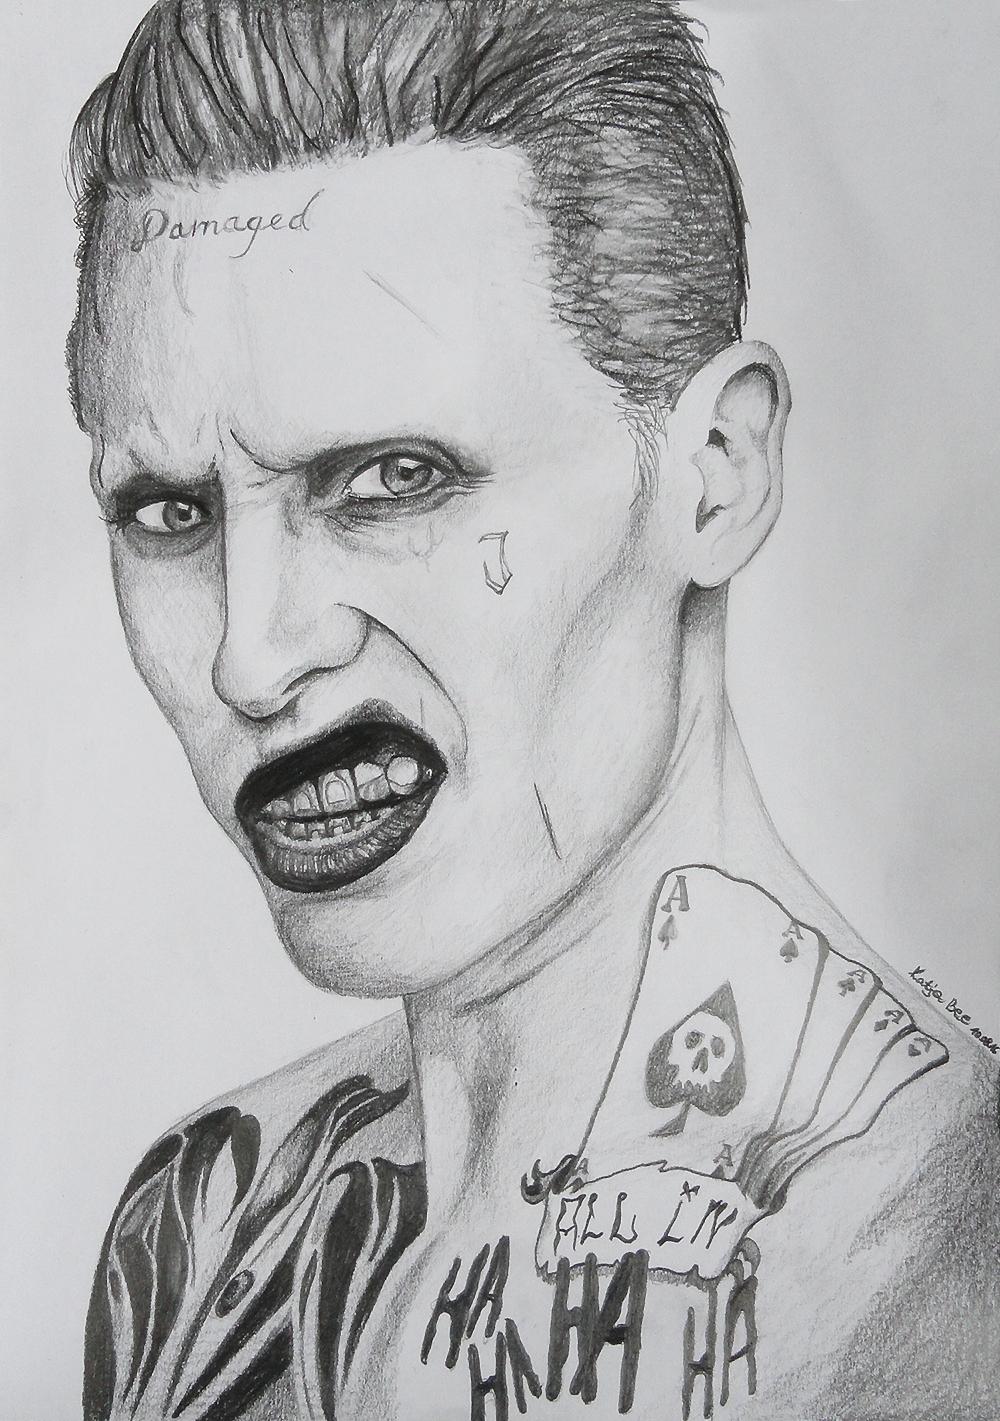 Portrait By A5ylum On DeviantArt